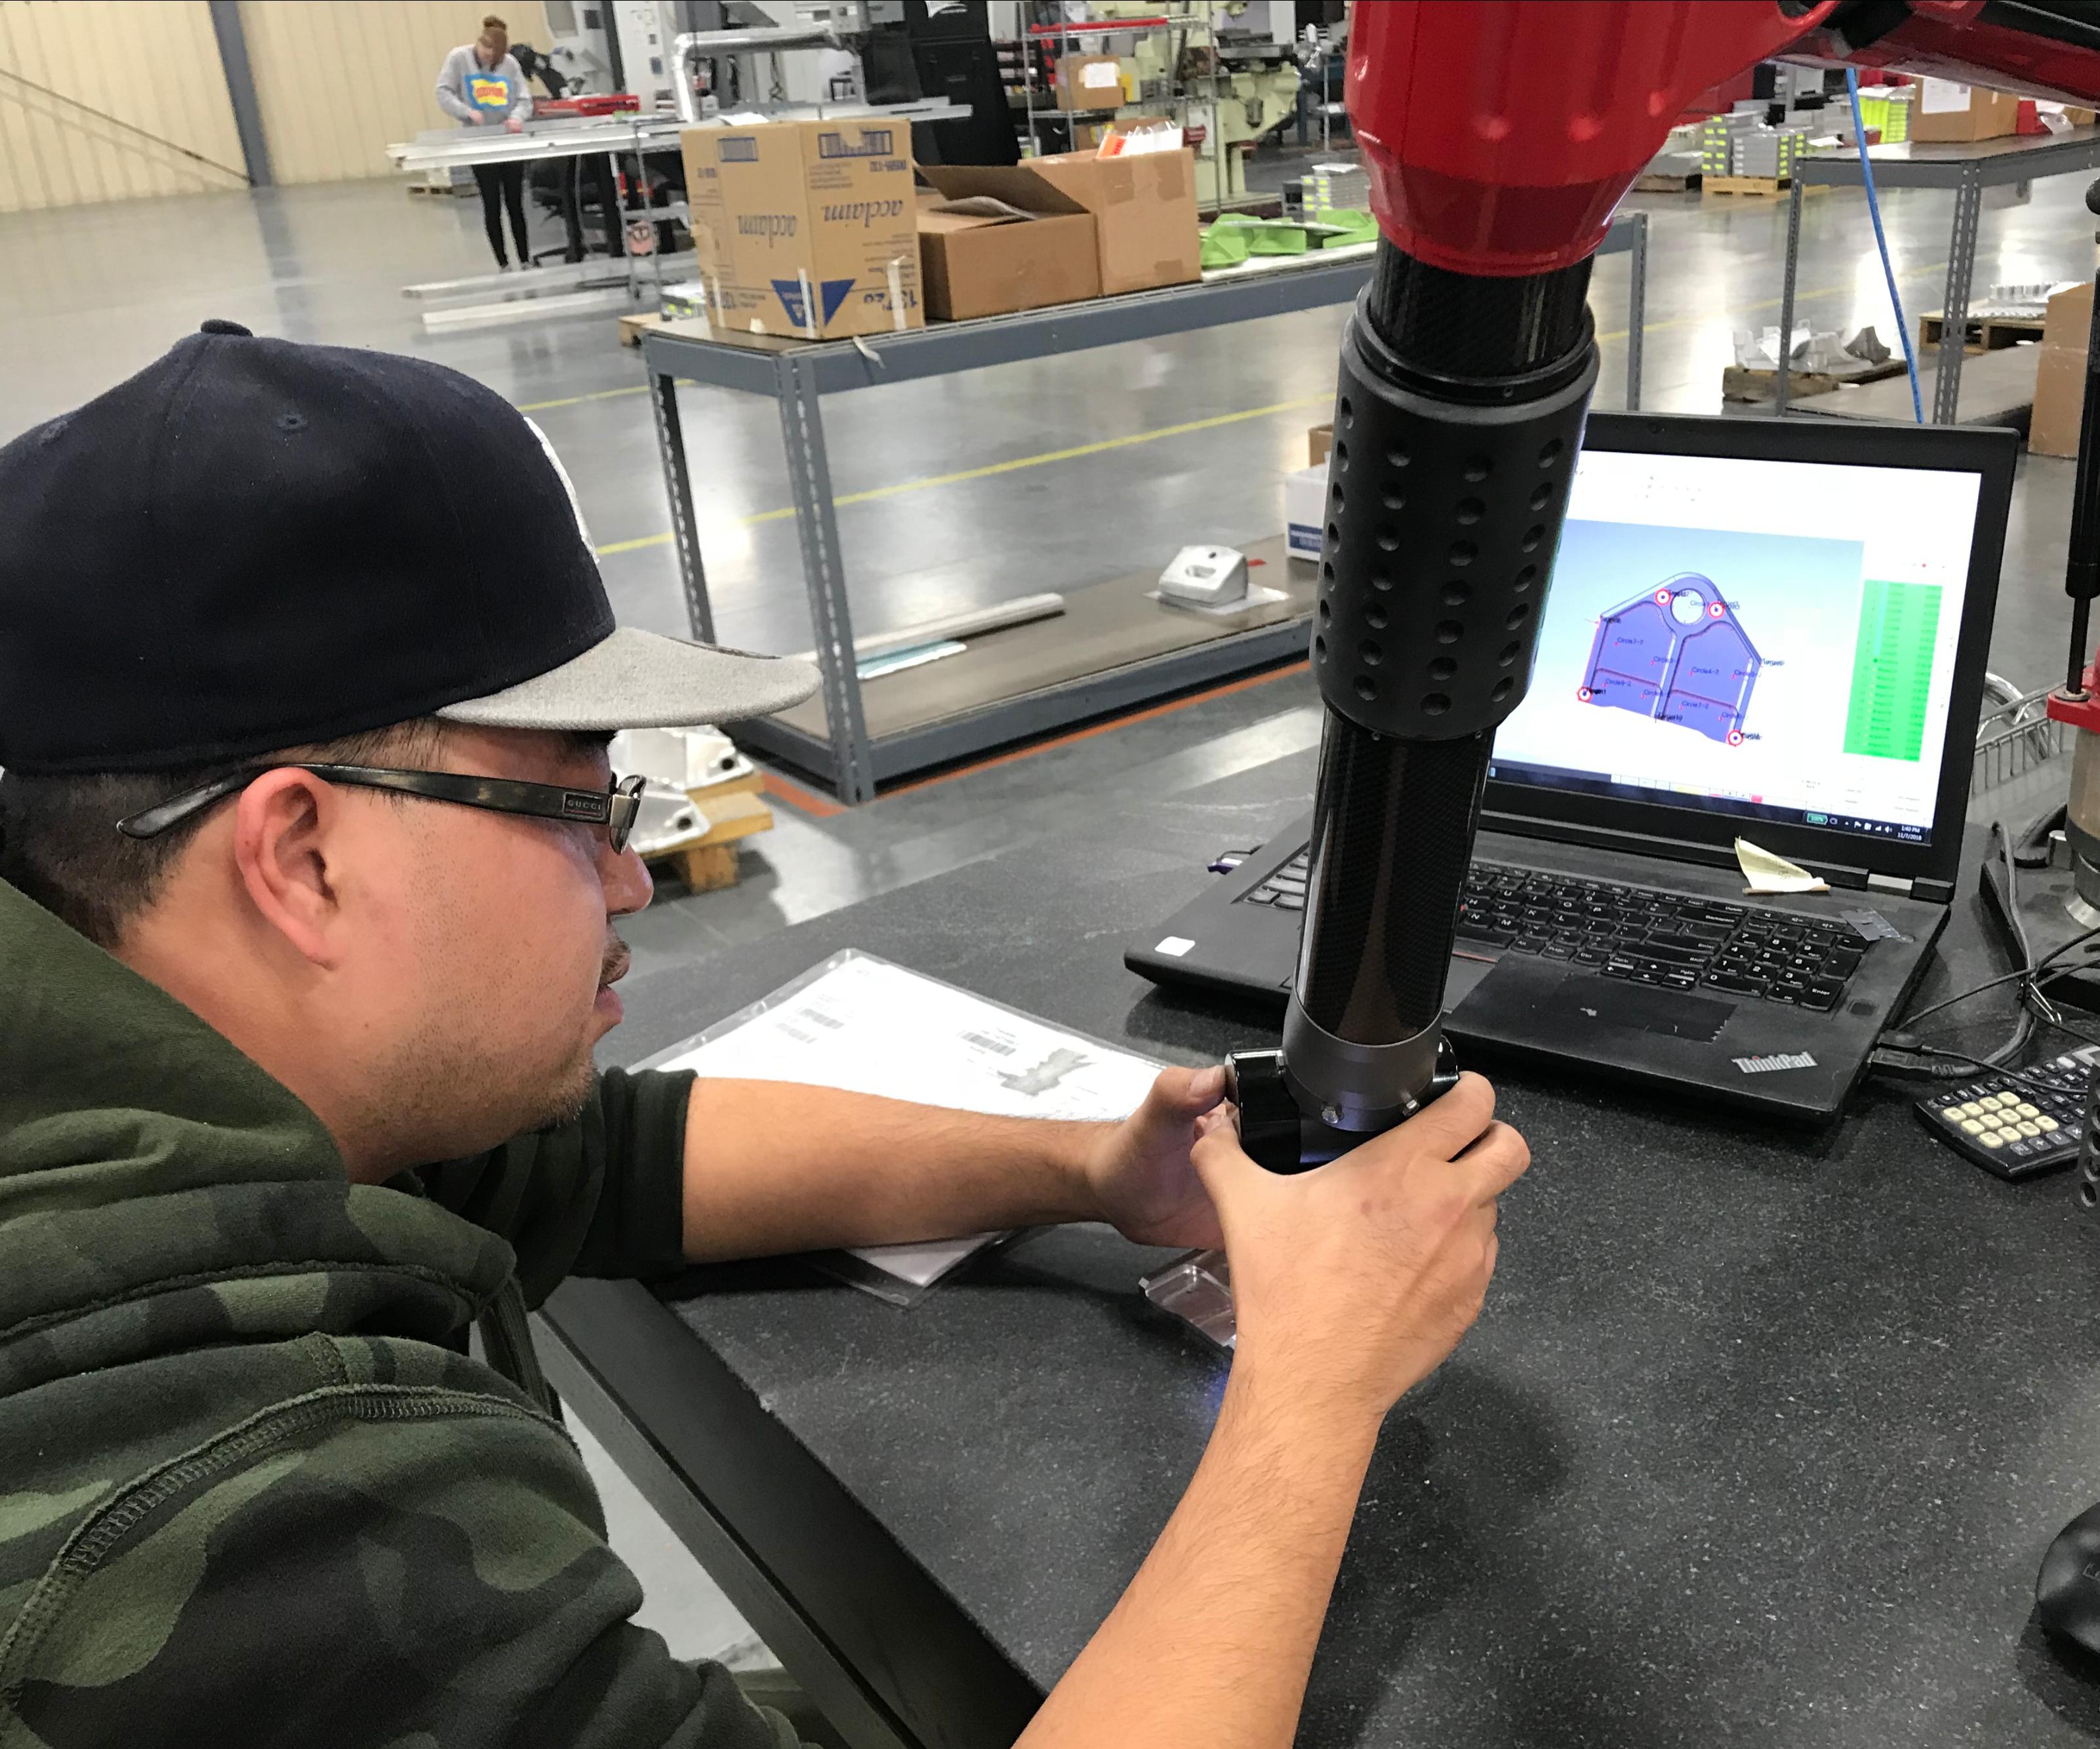 inspector handling a Romer portable arm CMM